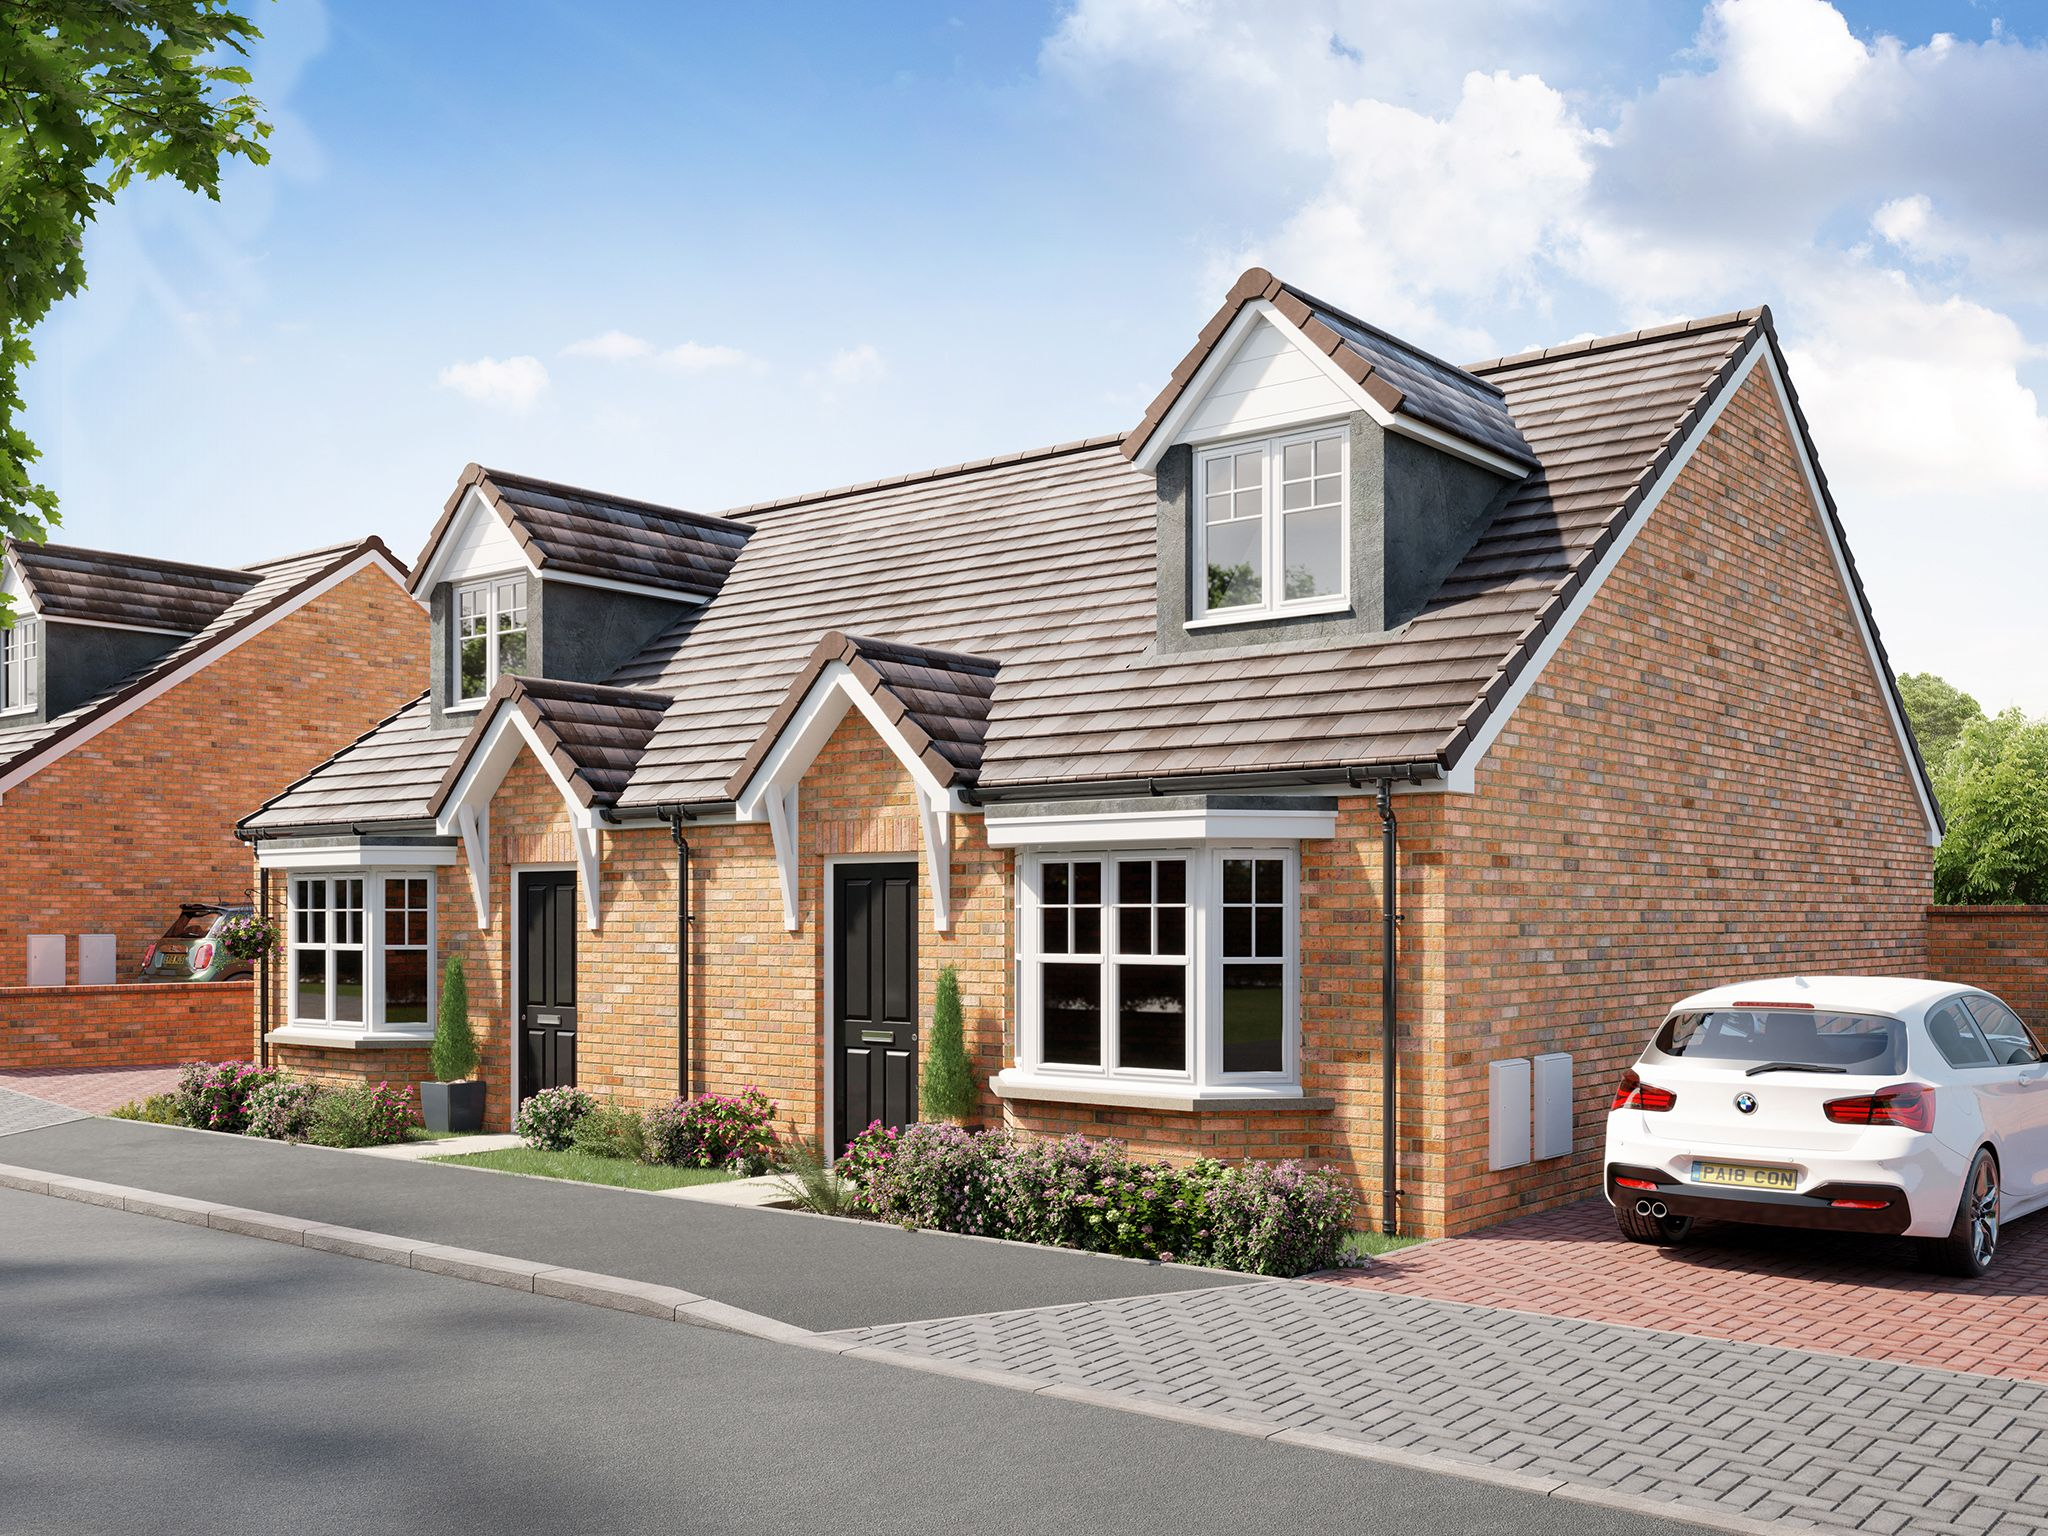 The Longlands development image 1 of 1